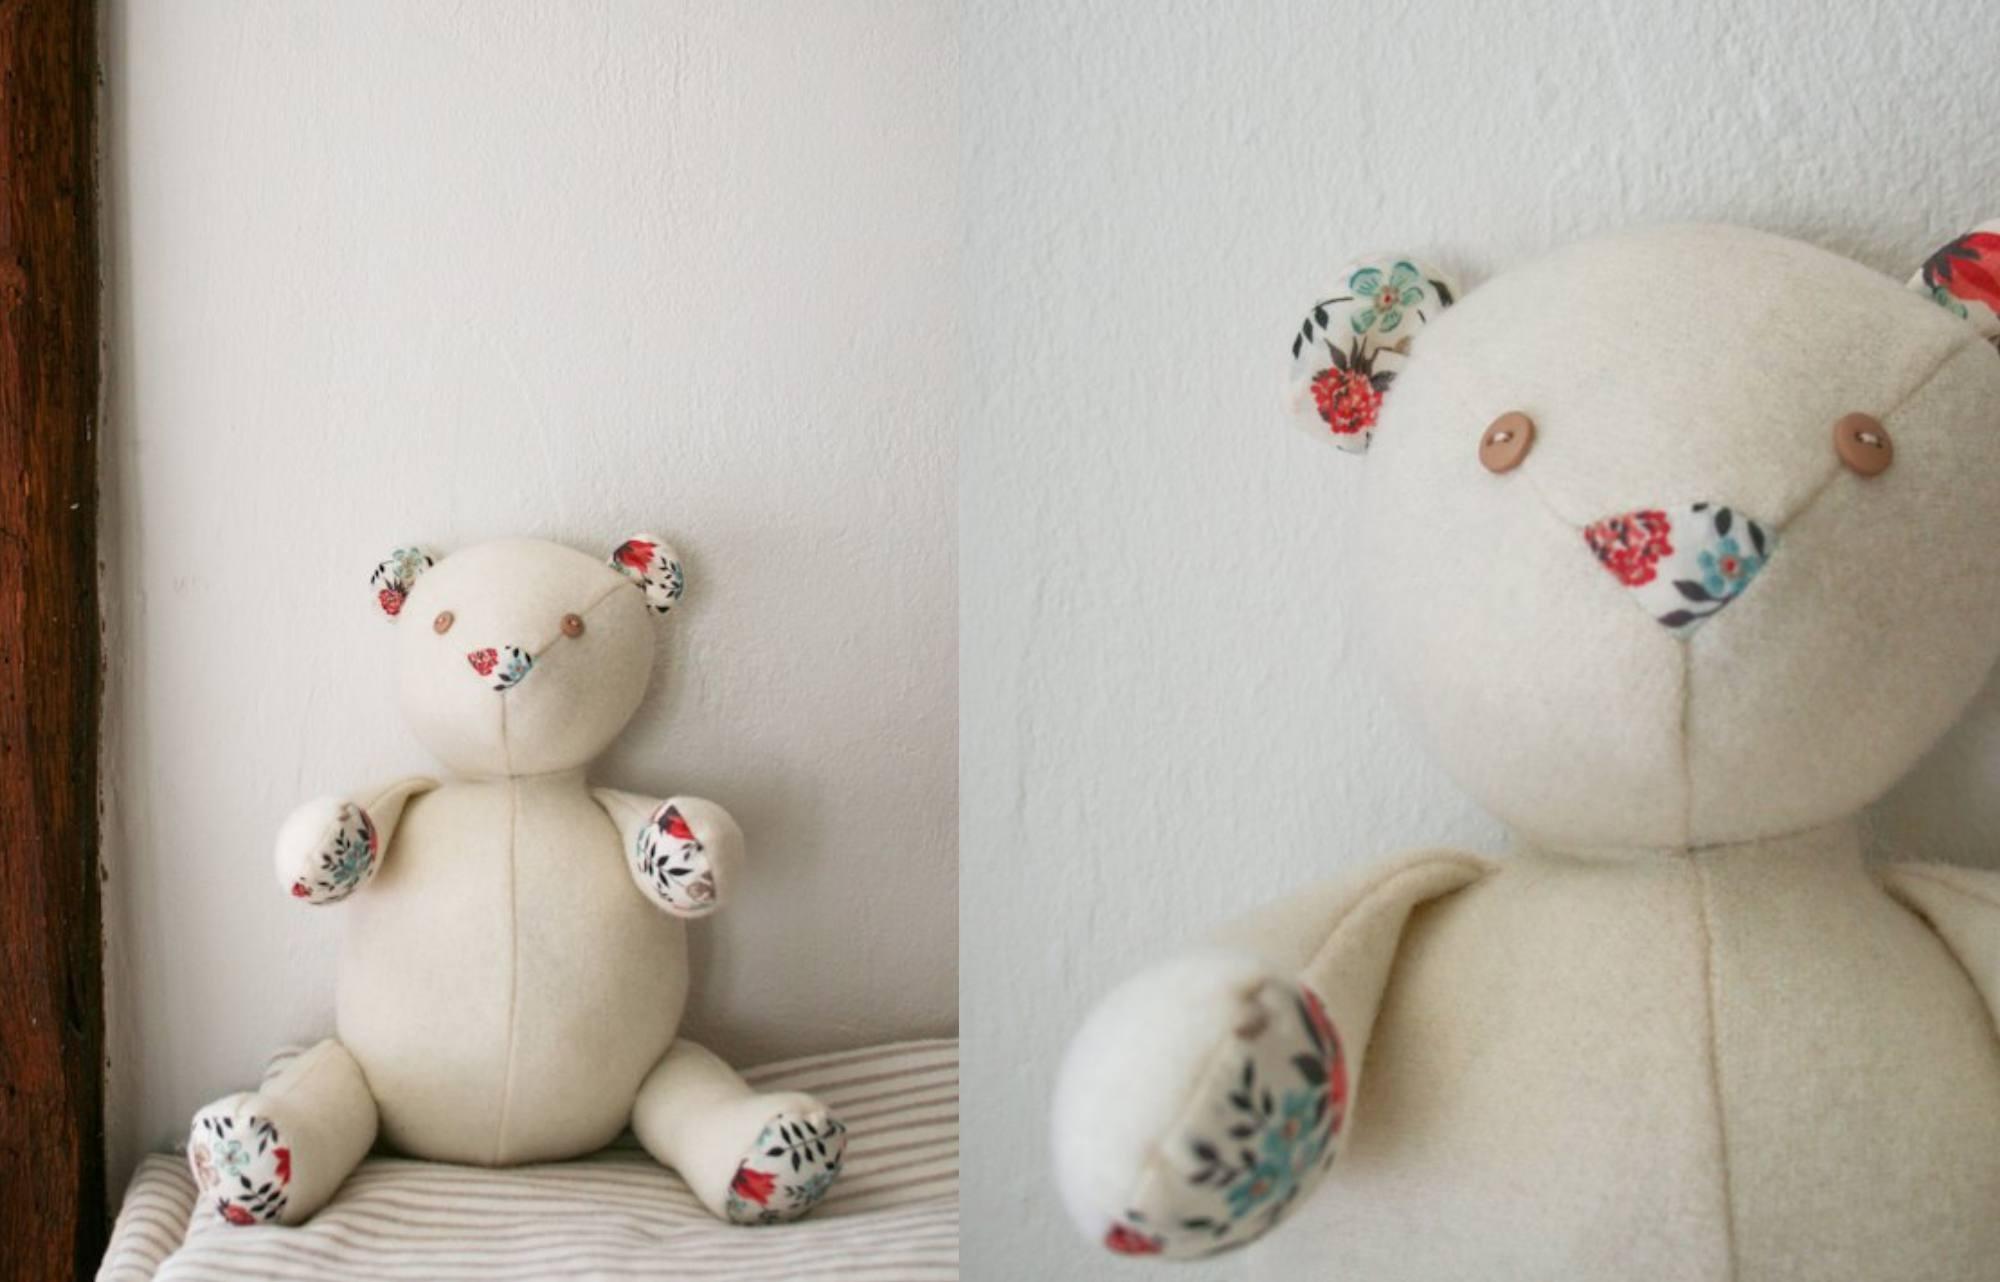 10 Adorable Teddy Bear Sewing Patterns - Memory Bear Sewing Pattern Free Printable